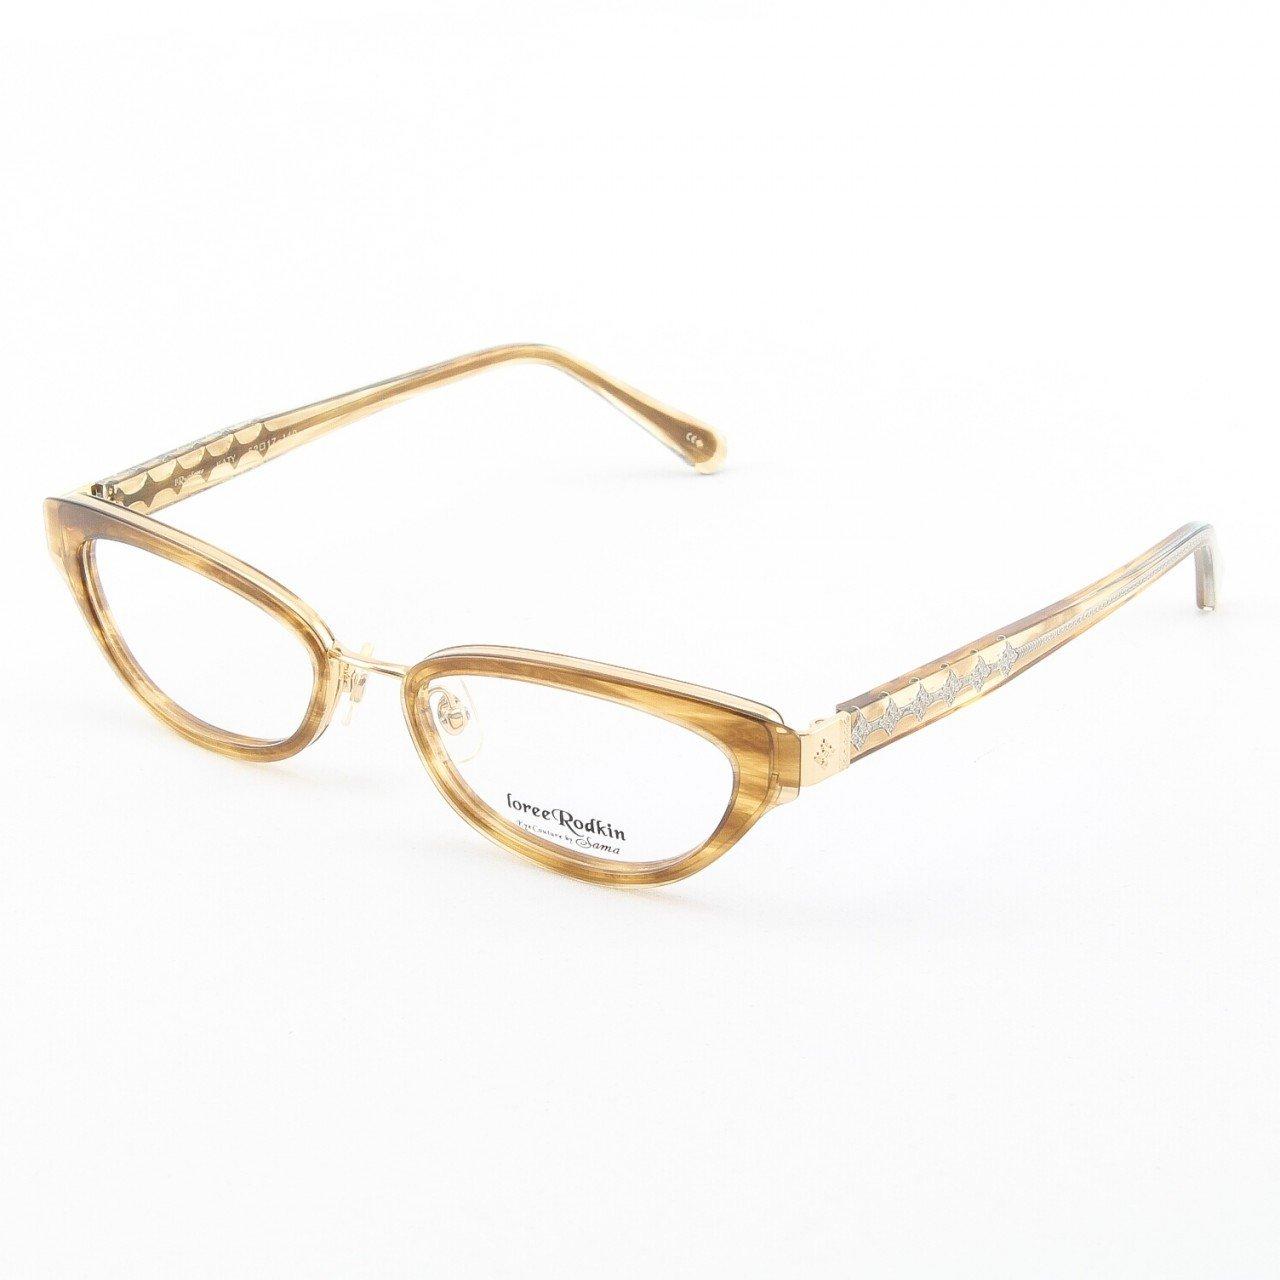 Loree Rodkin Katy Eyeglasses Topaz w/ Clear Lenses, Plastic Inserts and Decorative Temple Core